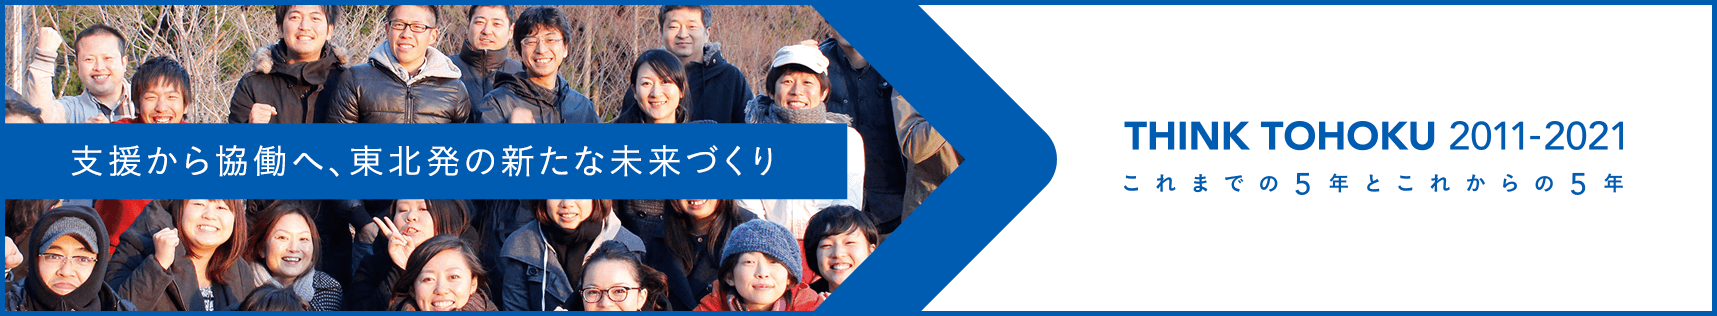 THINK TOHOKU 2011-2021 これまでの5年を振り返り、これからの5年をともに考えていきます。